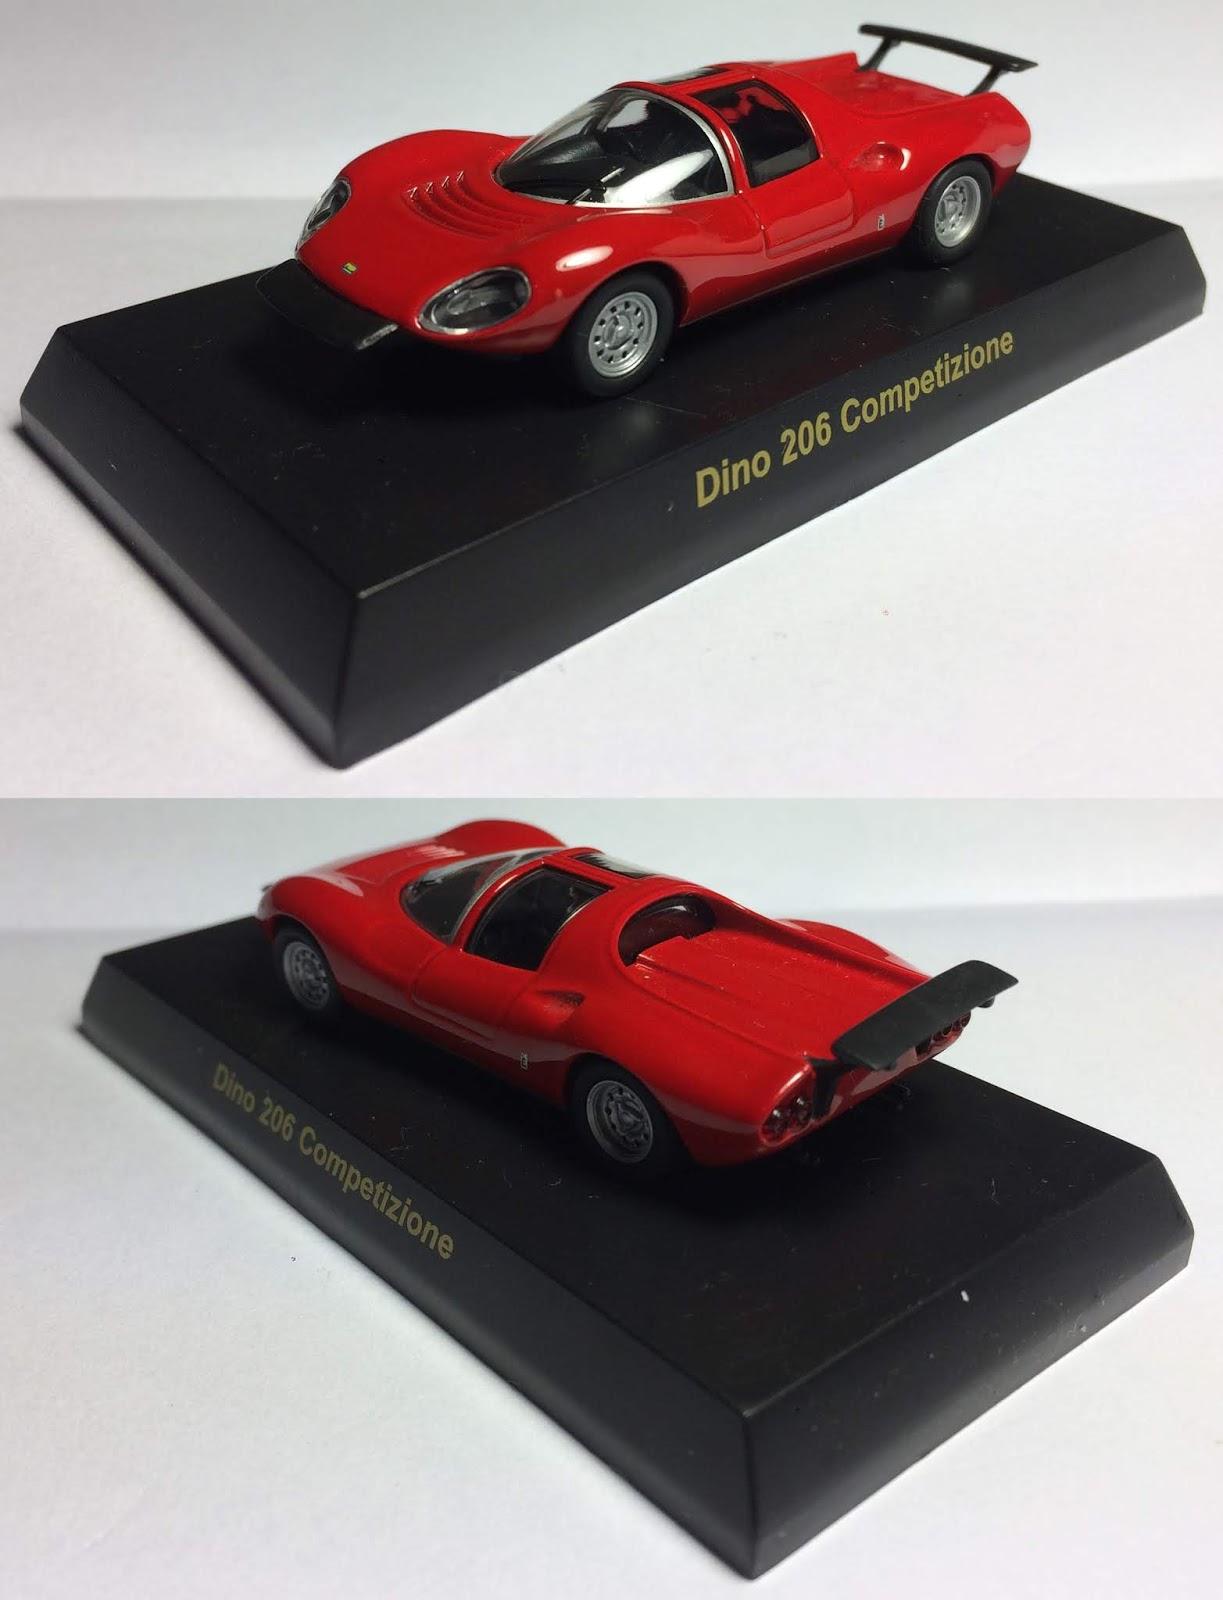 Kyosho 1//64 Ferrari III Dino 206 Competizione Diecast Car Model RED